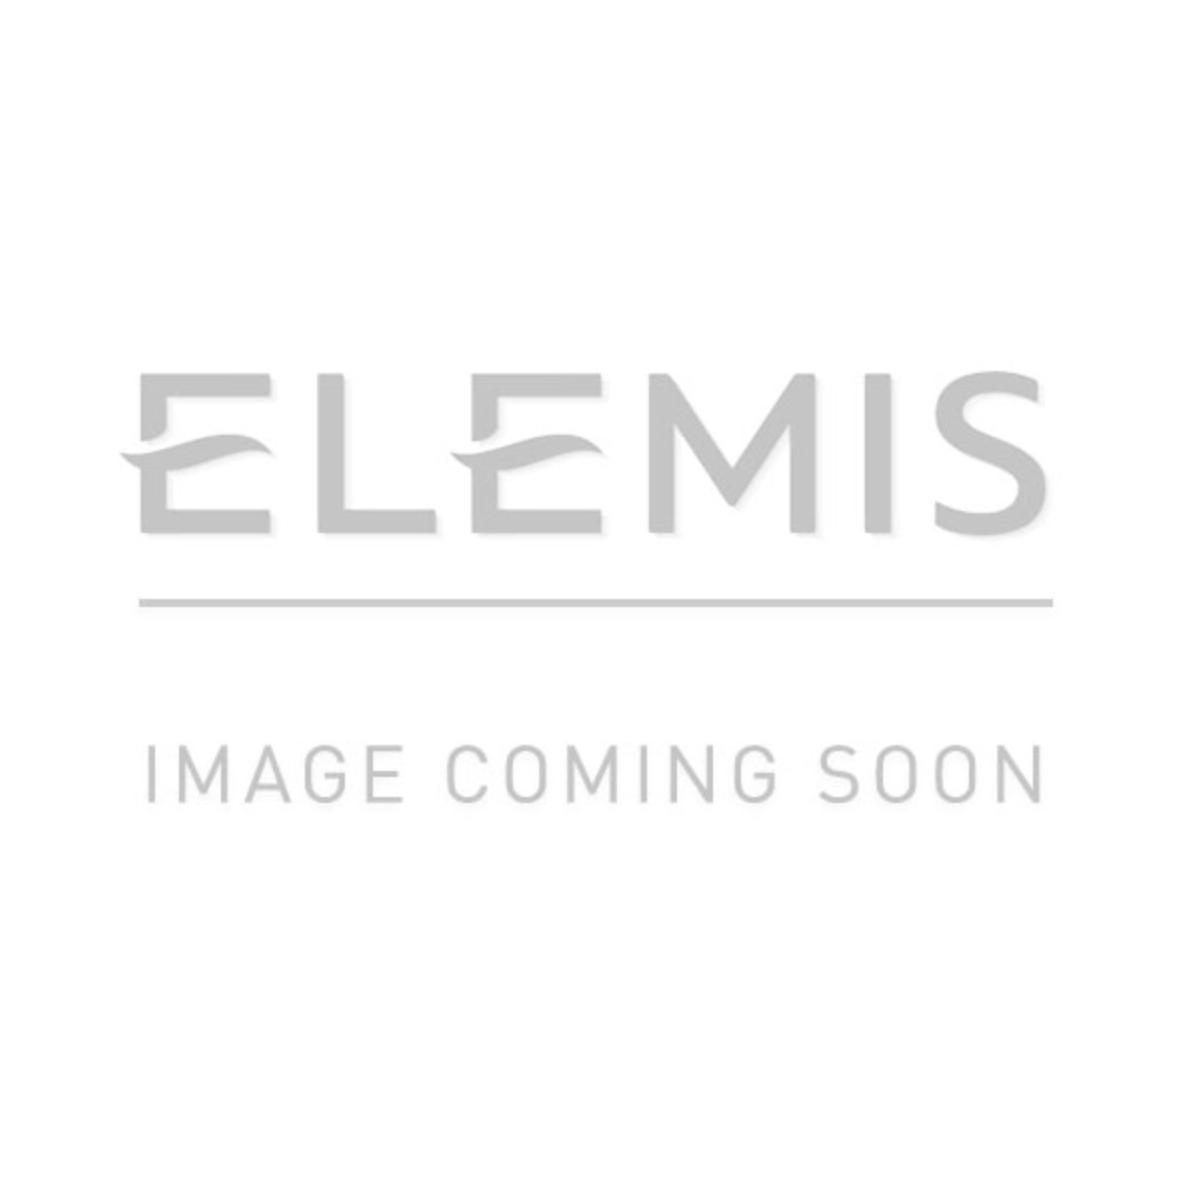 Online Exclusive Balancing Essentials Collection